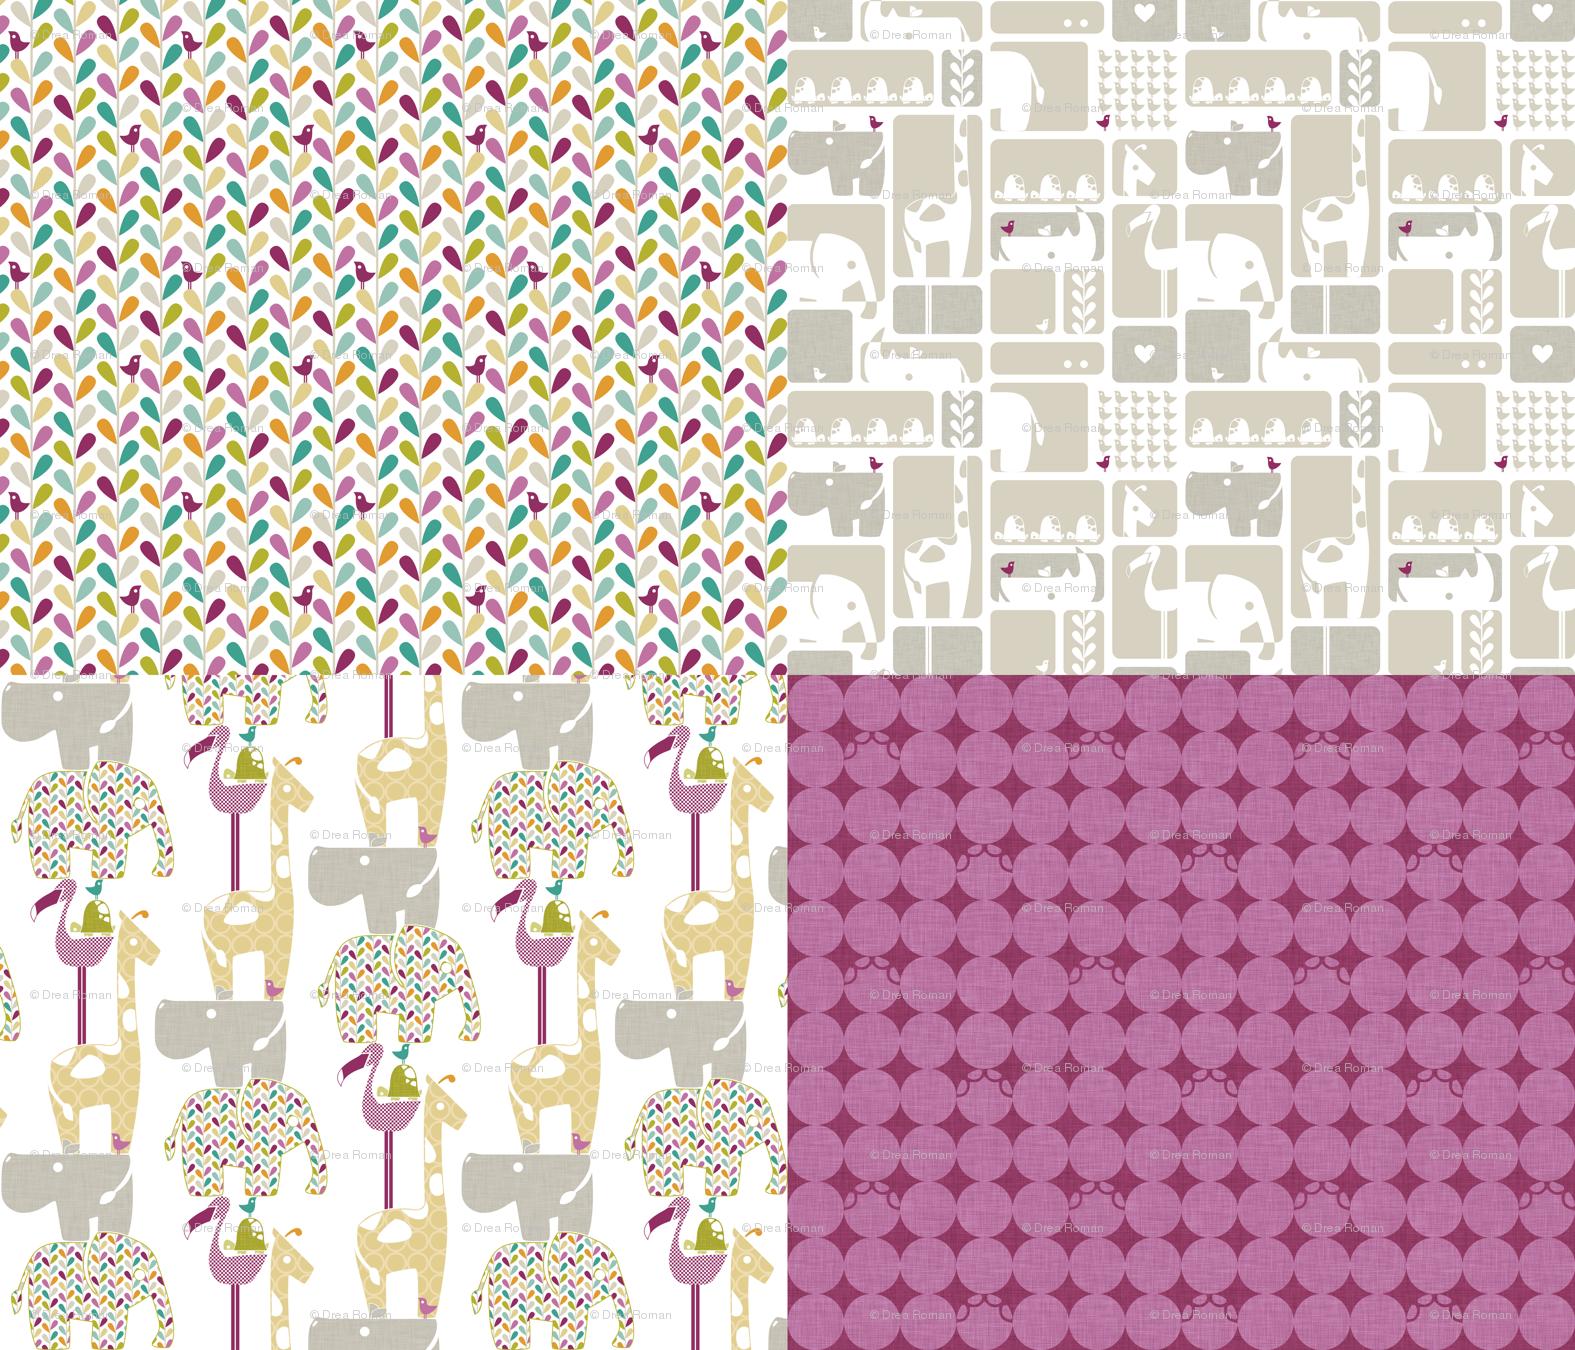 Elephant Skin Print Fabric Hippo fabric wallpaper gift 1575x1350